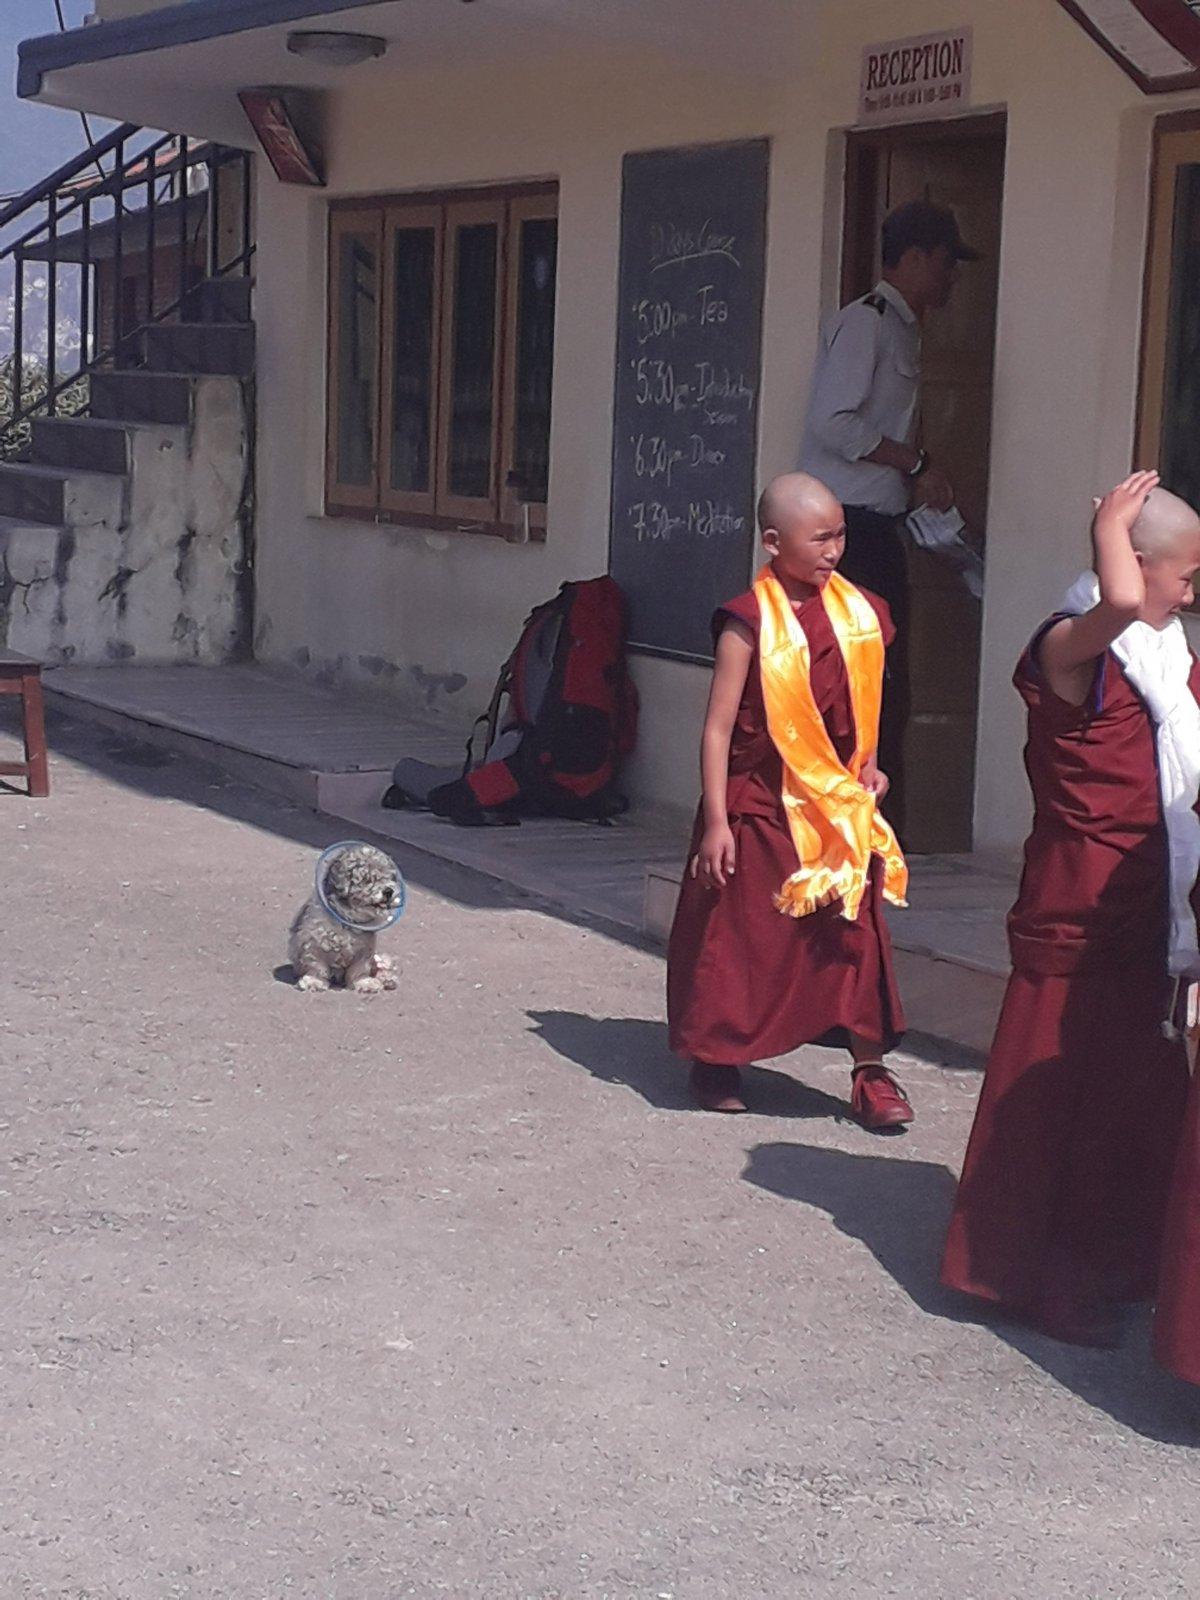 A buddhista kolostor ifjú lakói az udvaron •  Fotó: Kiss Judit